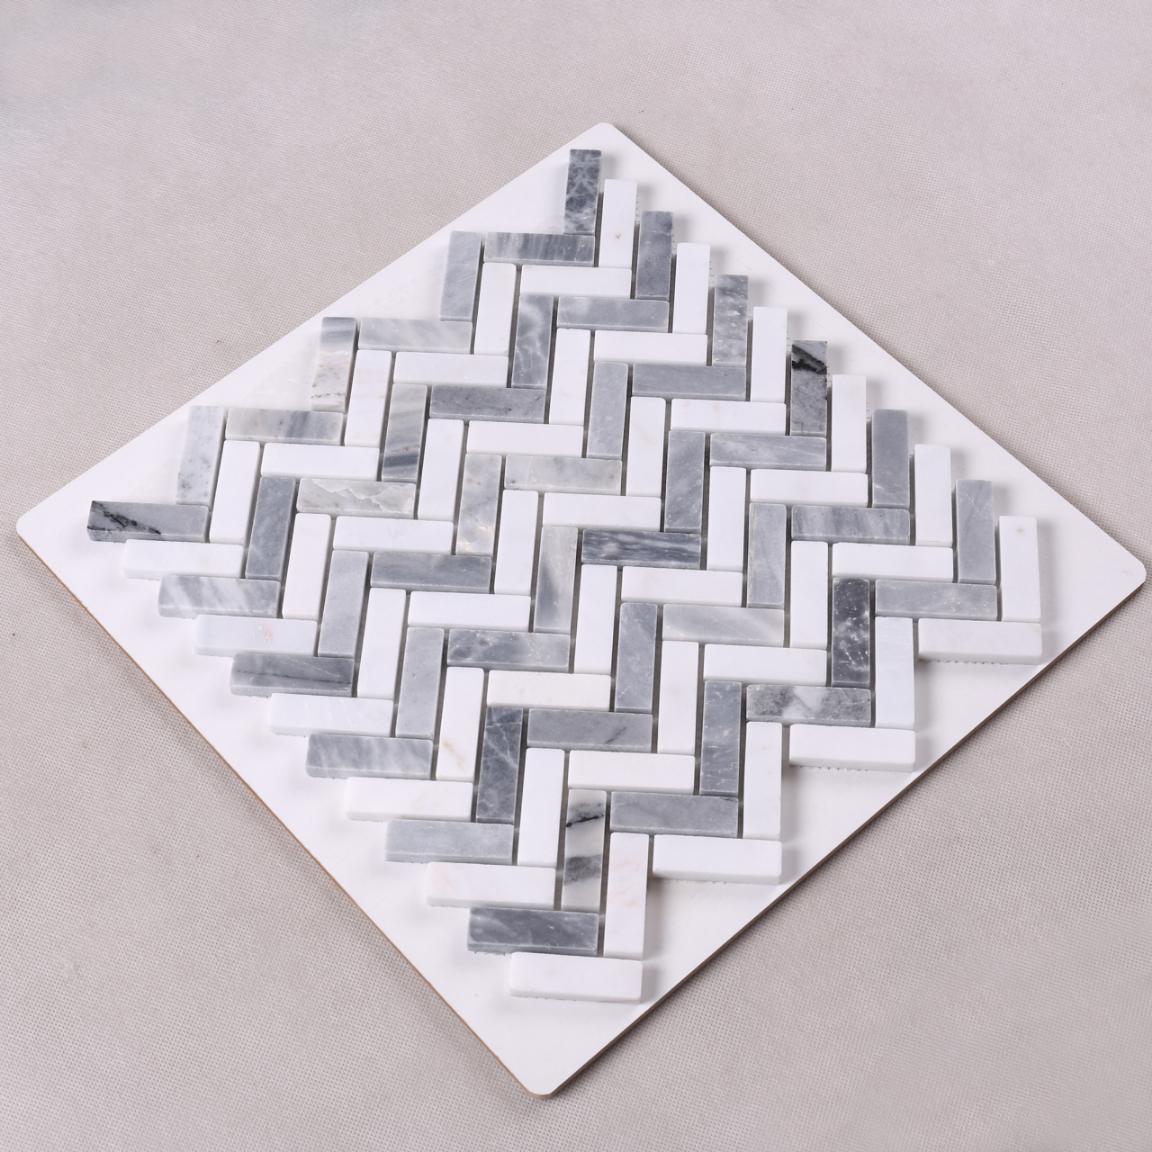 Heng Xing-Stone Mosaic Tile Manufacturer, Carrara Marble Mosaic Tile | Heng Xing-2